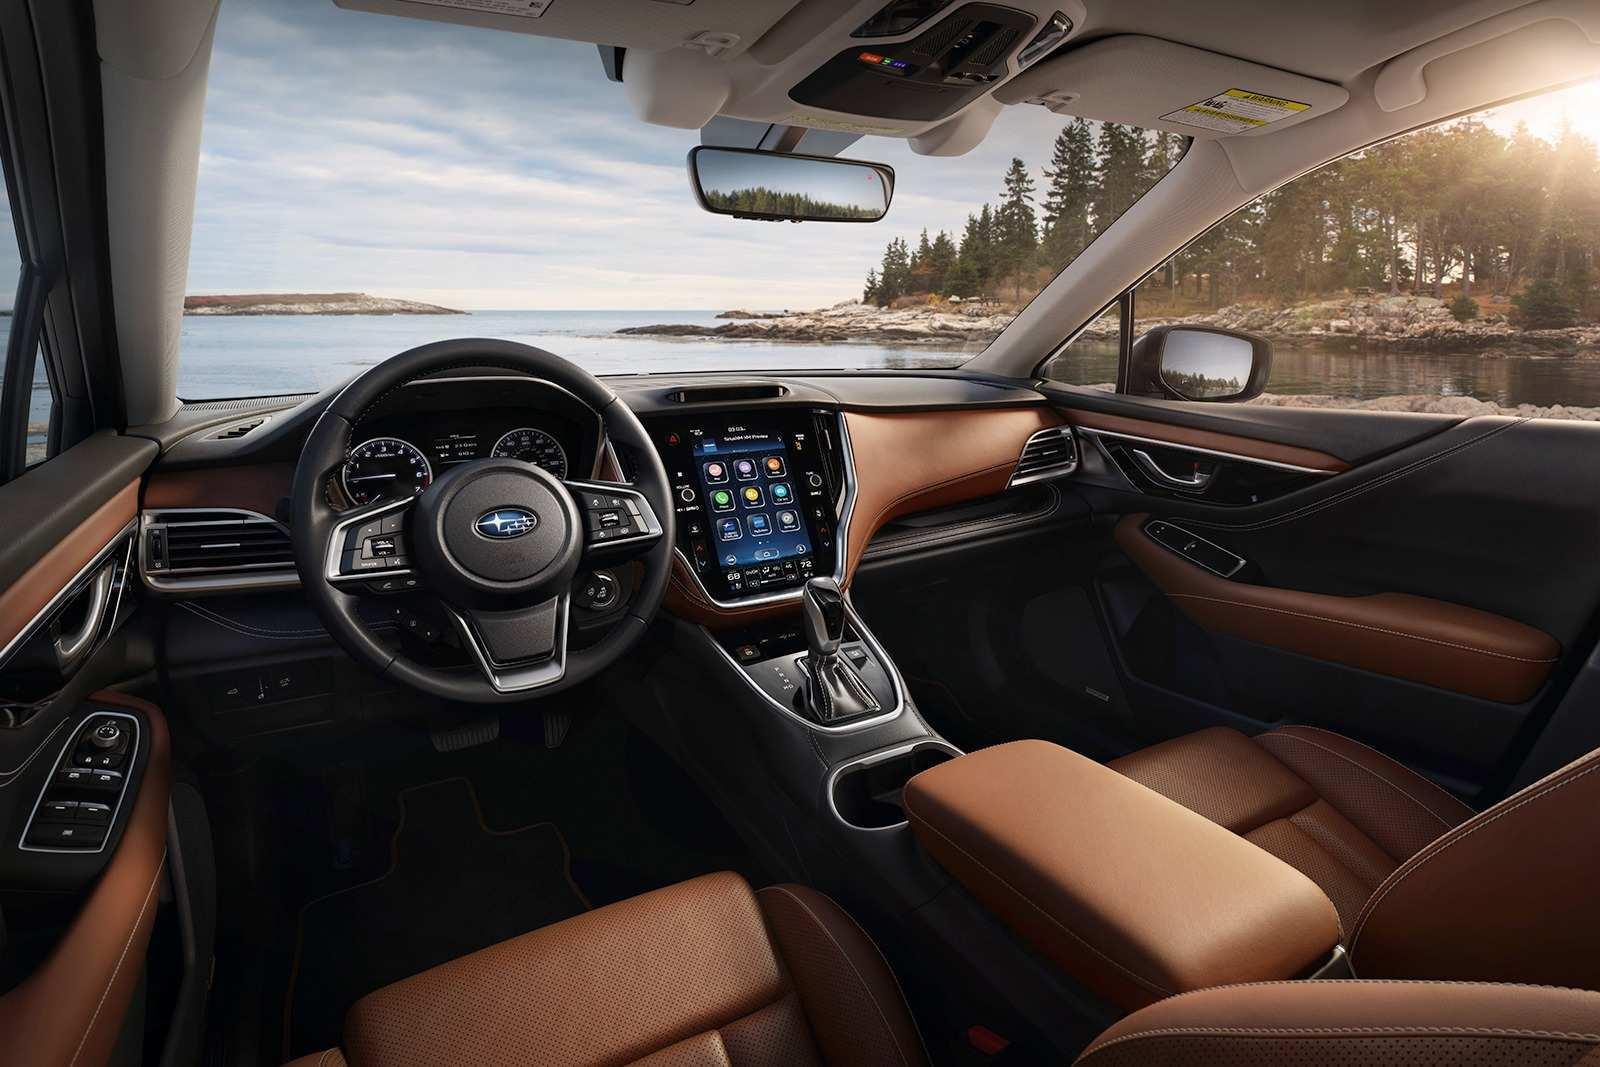 43 Concept of Subaru Outback 2020 Price Exterior for Subaru Outback 2020 Price